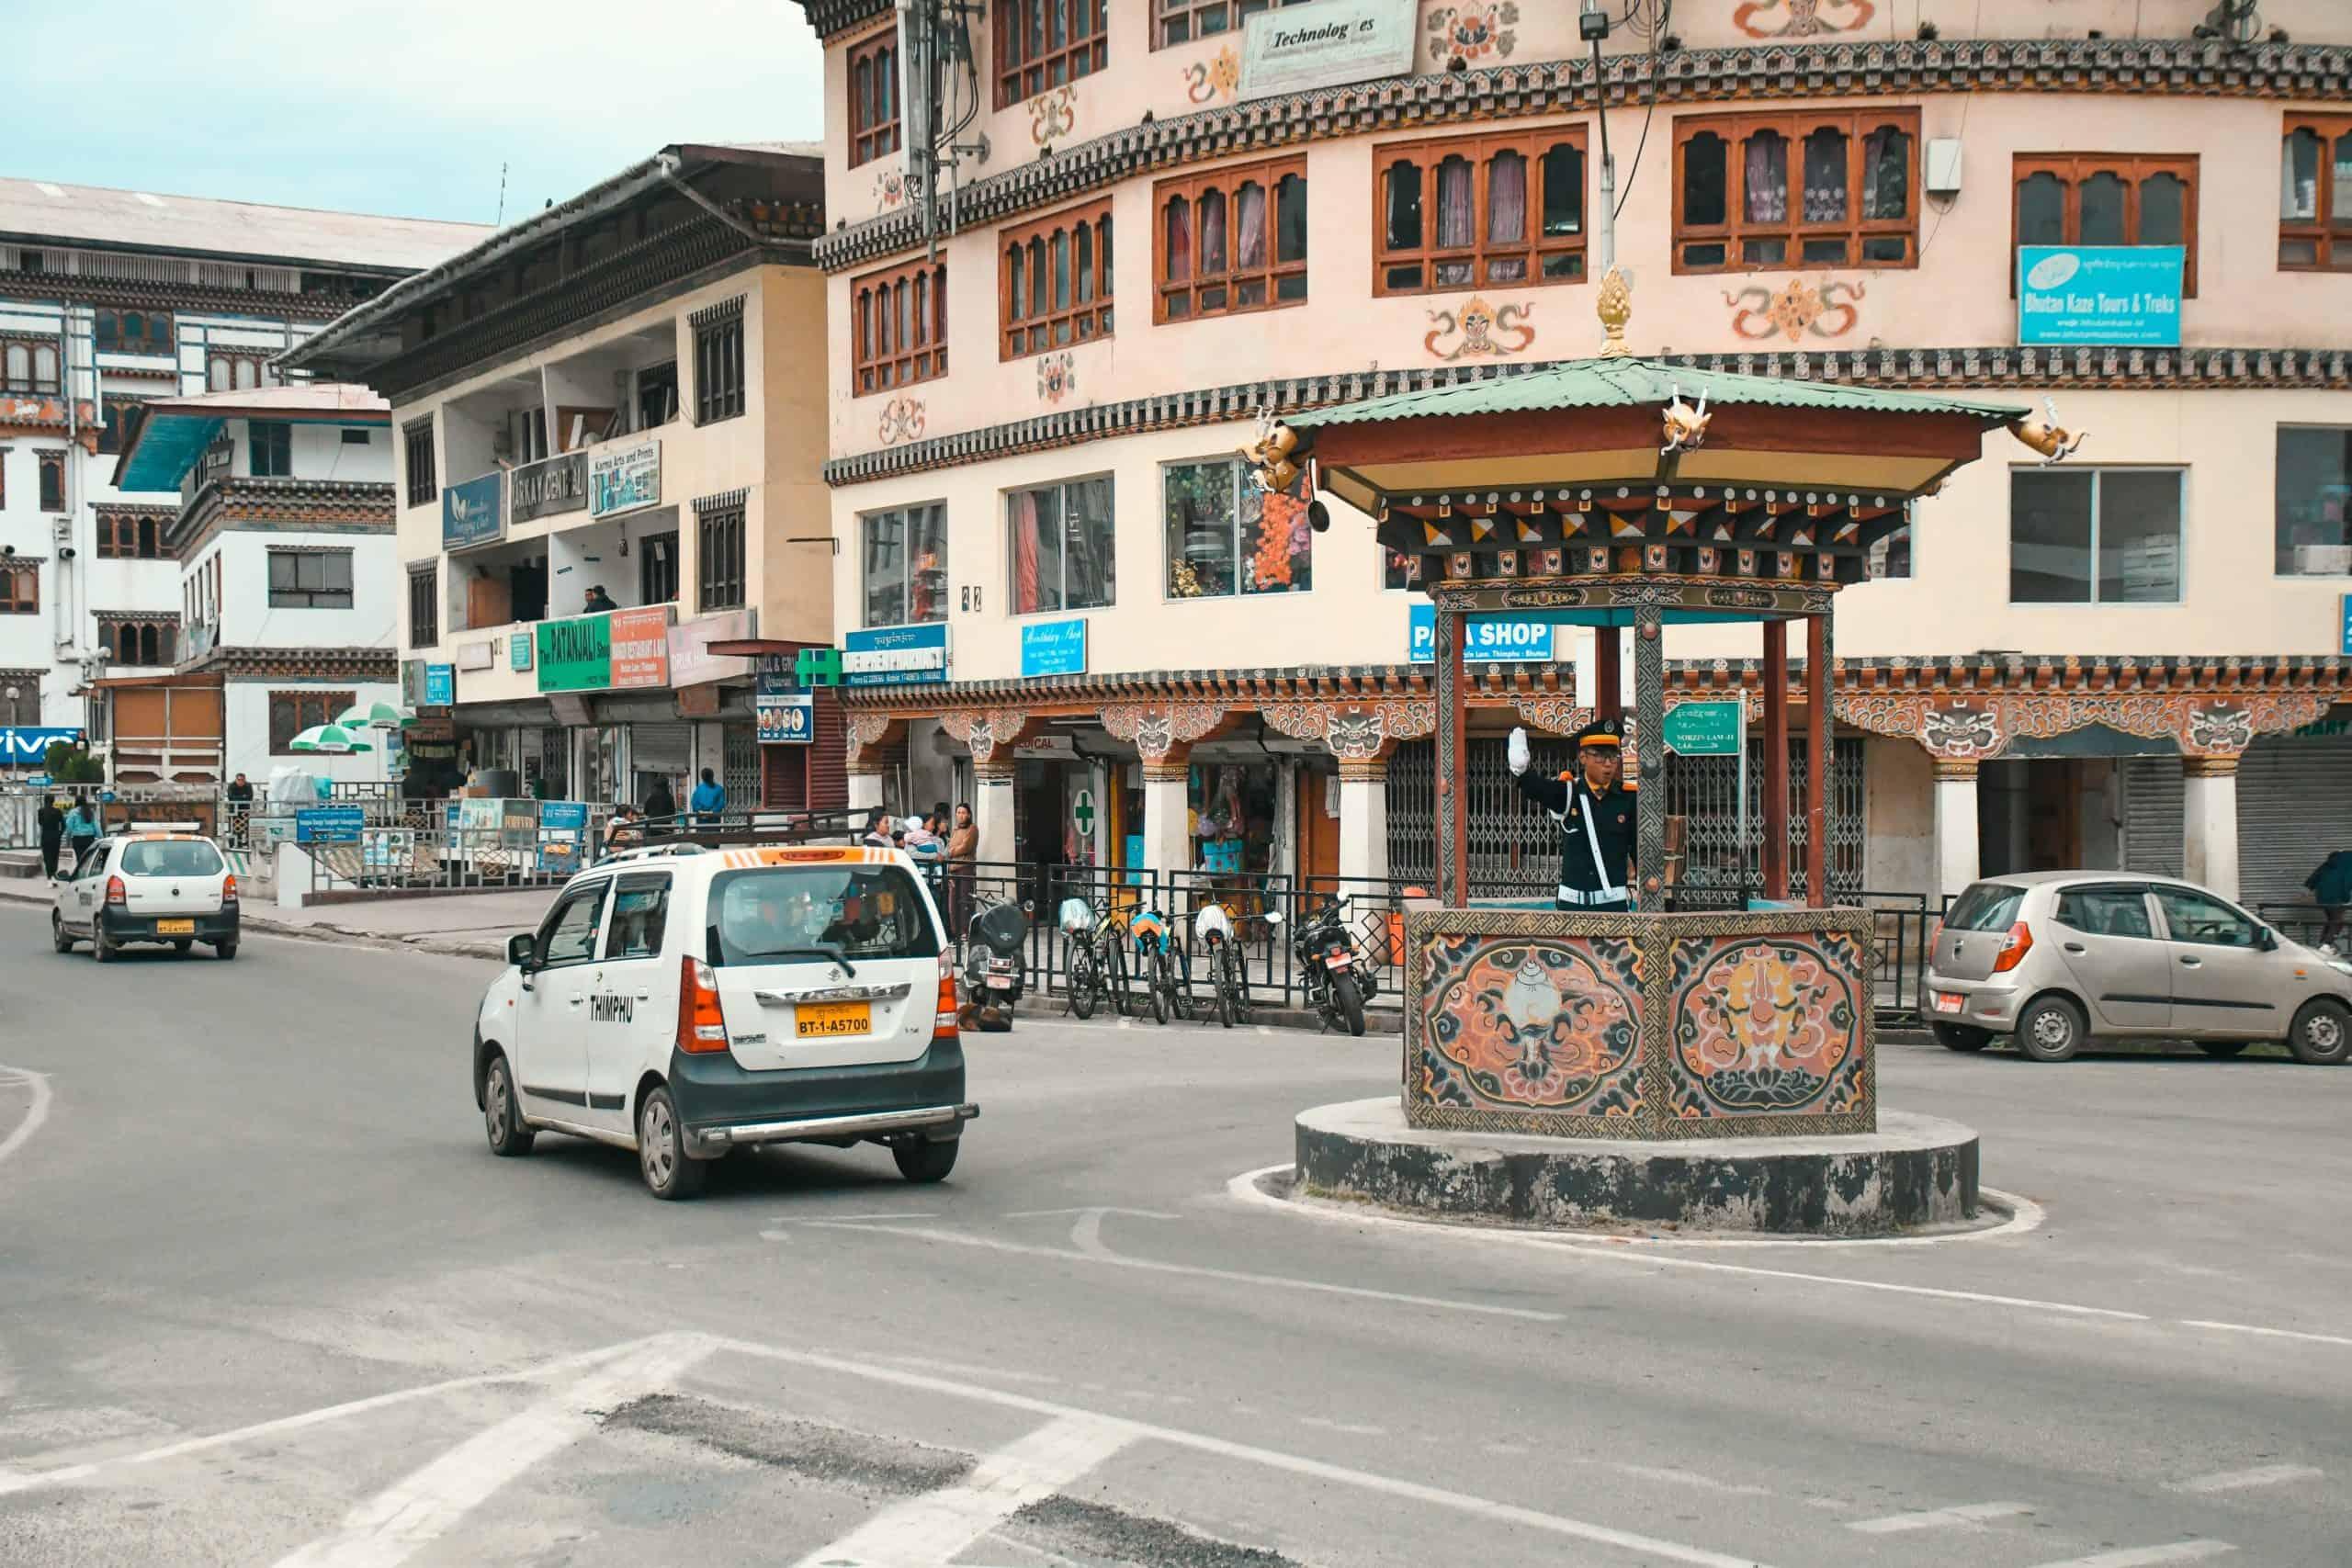 traffic light in Bhutan